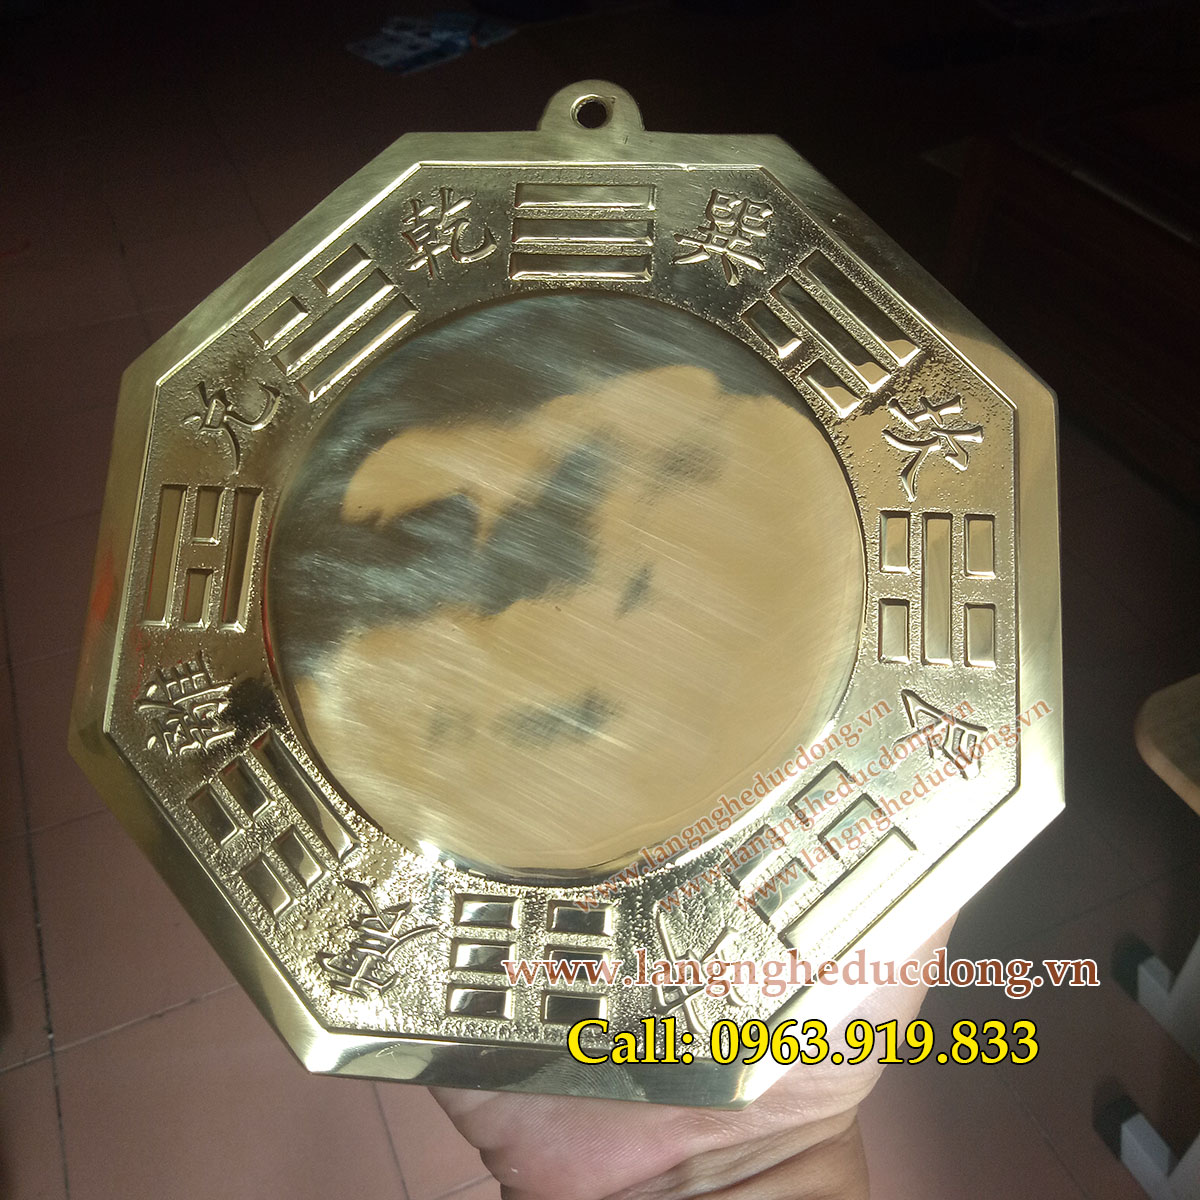 langngheducdong.vn - gương cầu, gương bát quoái, gương cầu bằng đồng, gương cầu phong thủy